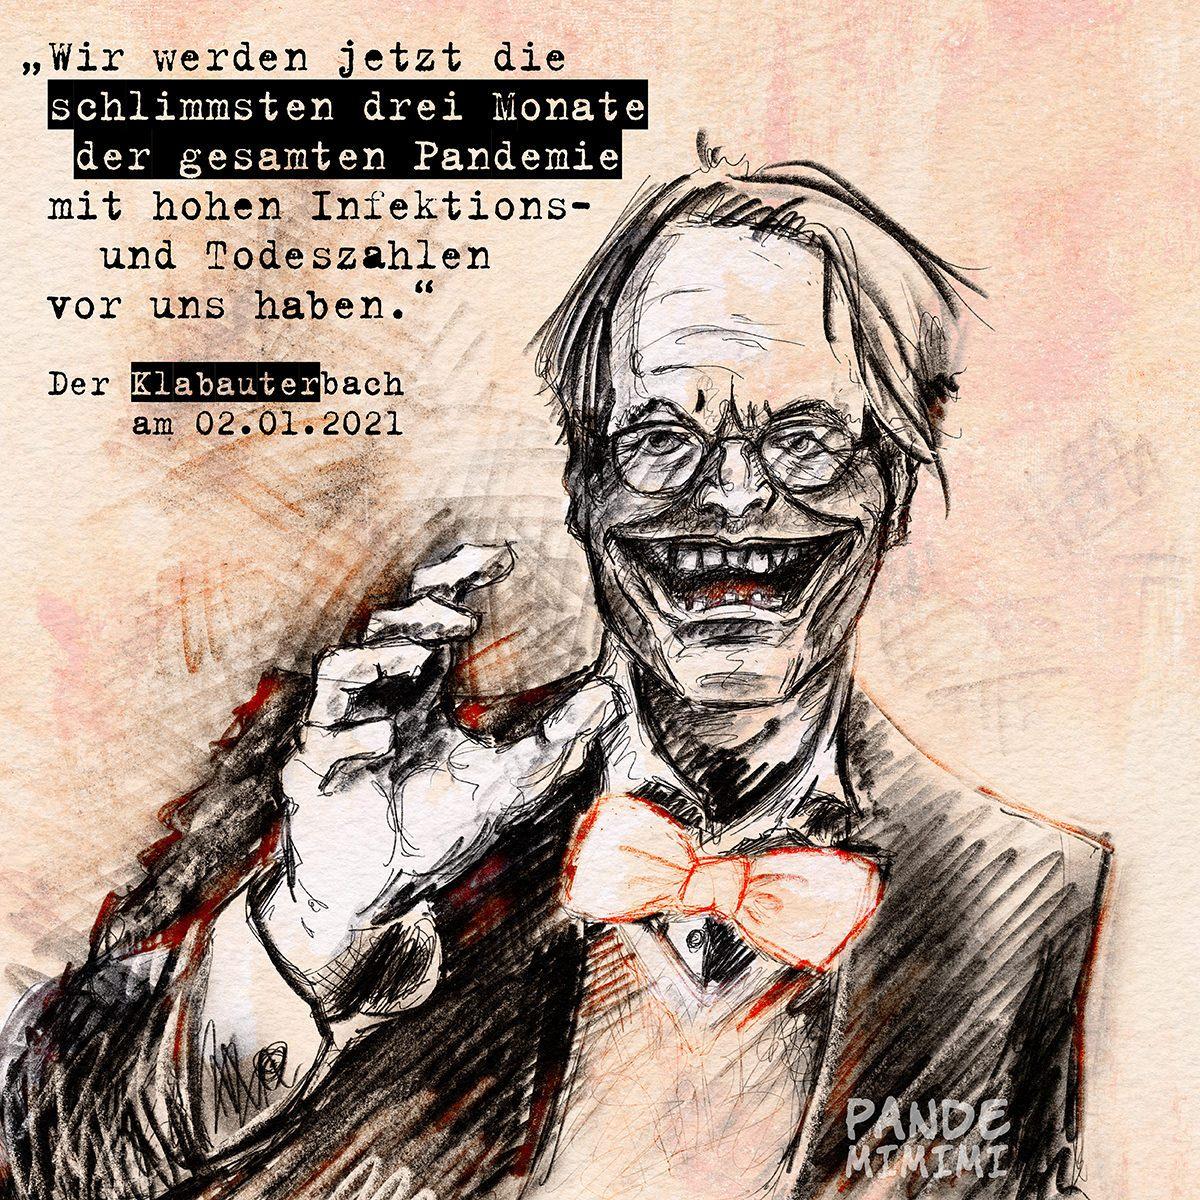 Der Klabauter-Joker, 02.01.2021